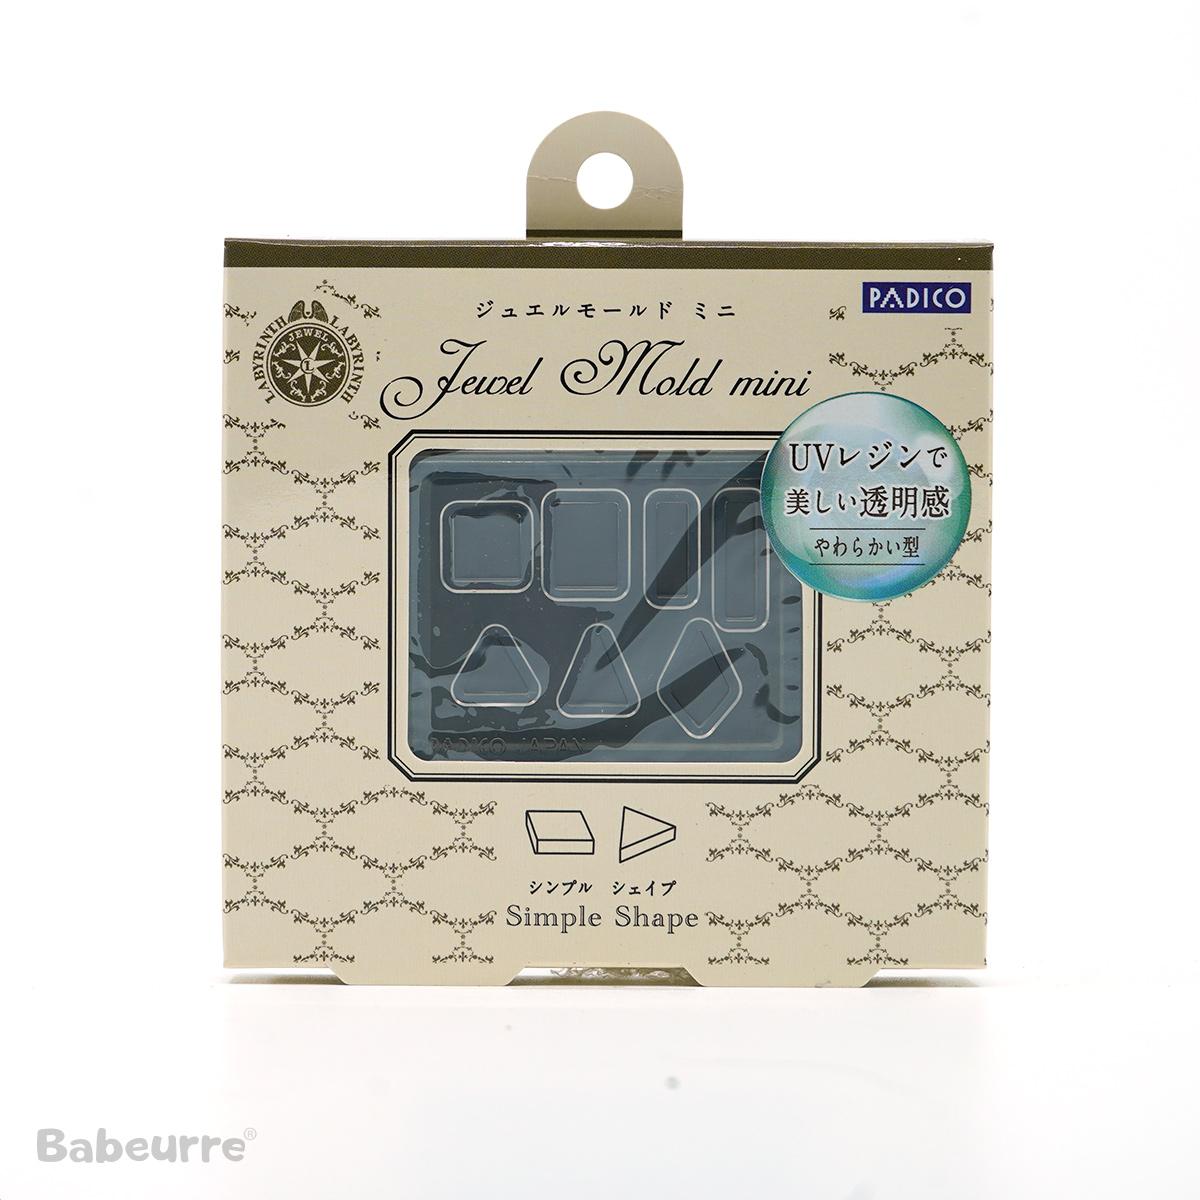 Padico mallen Jewel Mold Mini Simple Shape